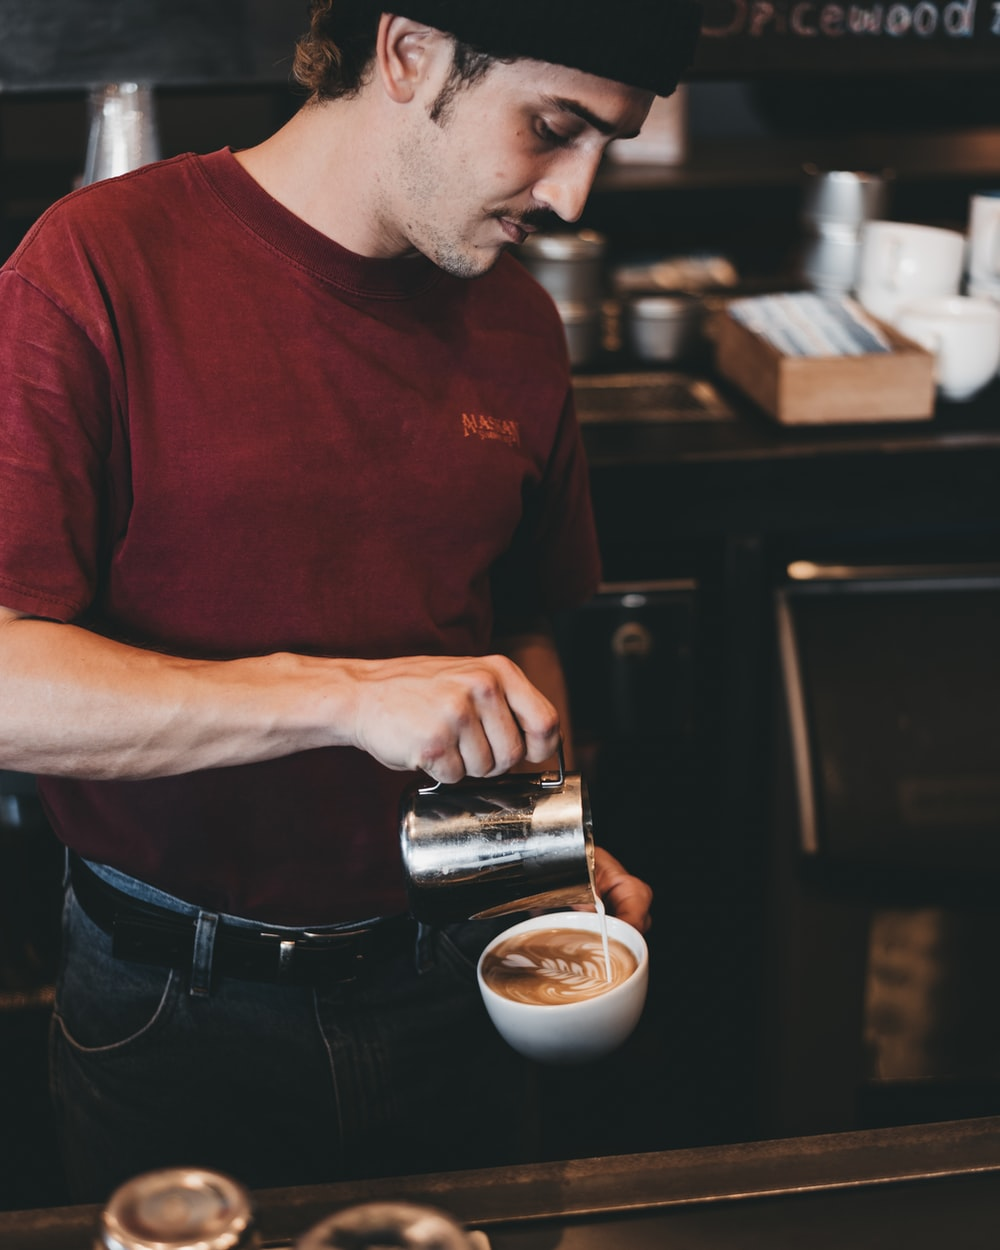 man holding teacup